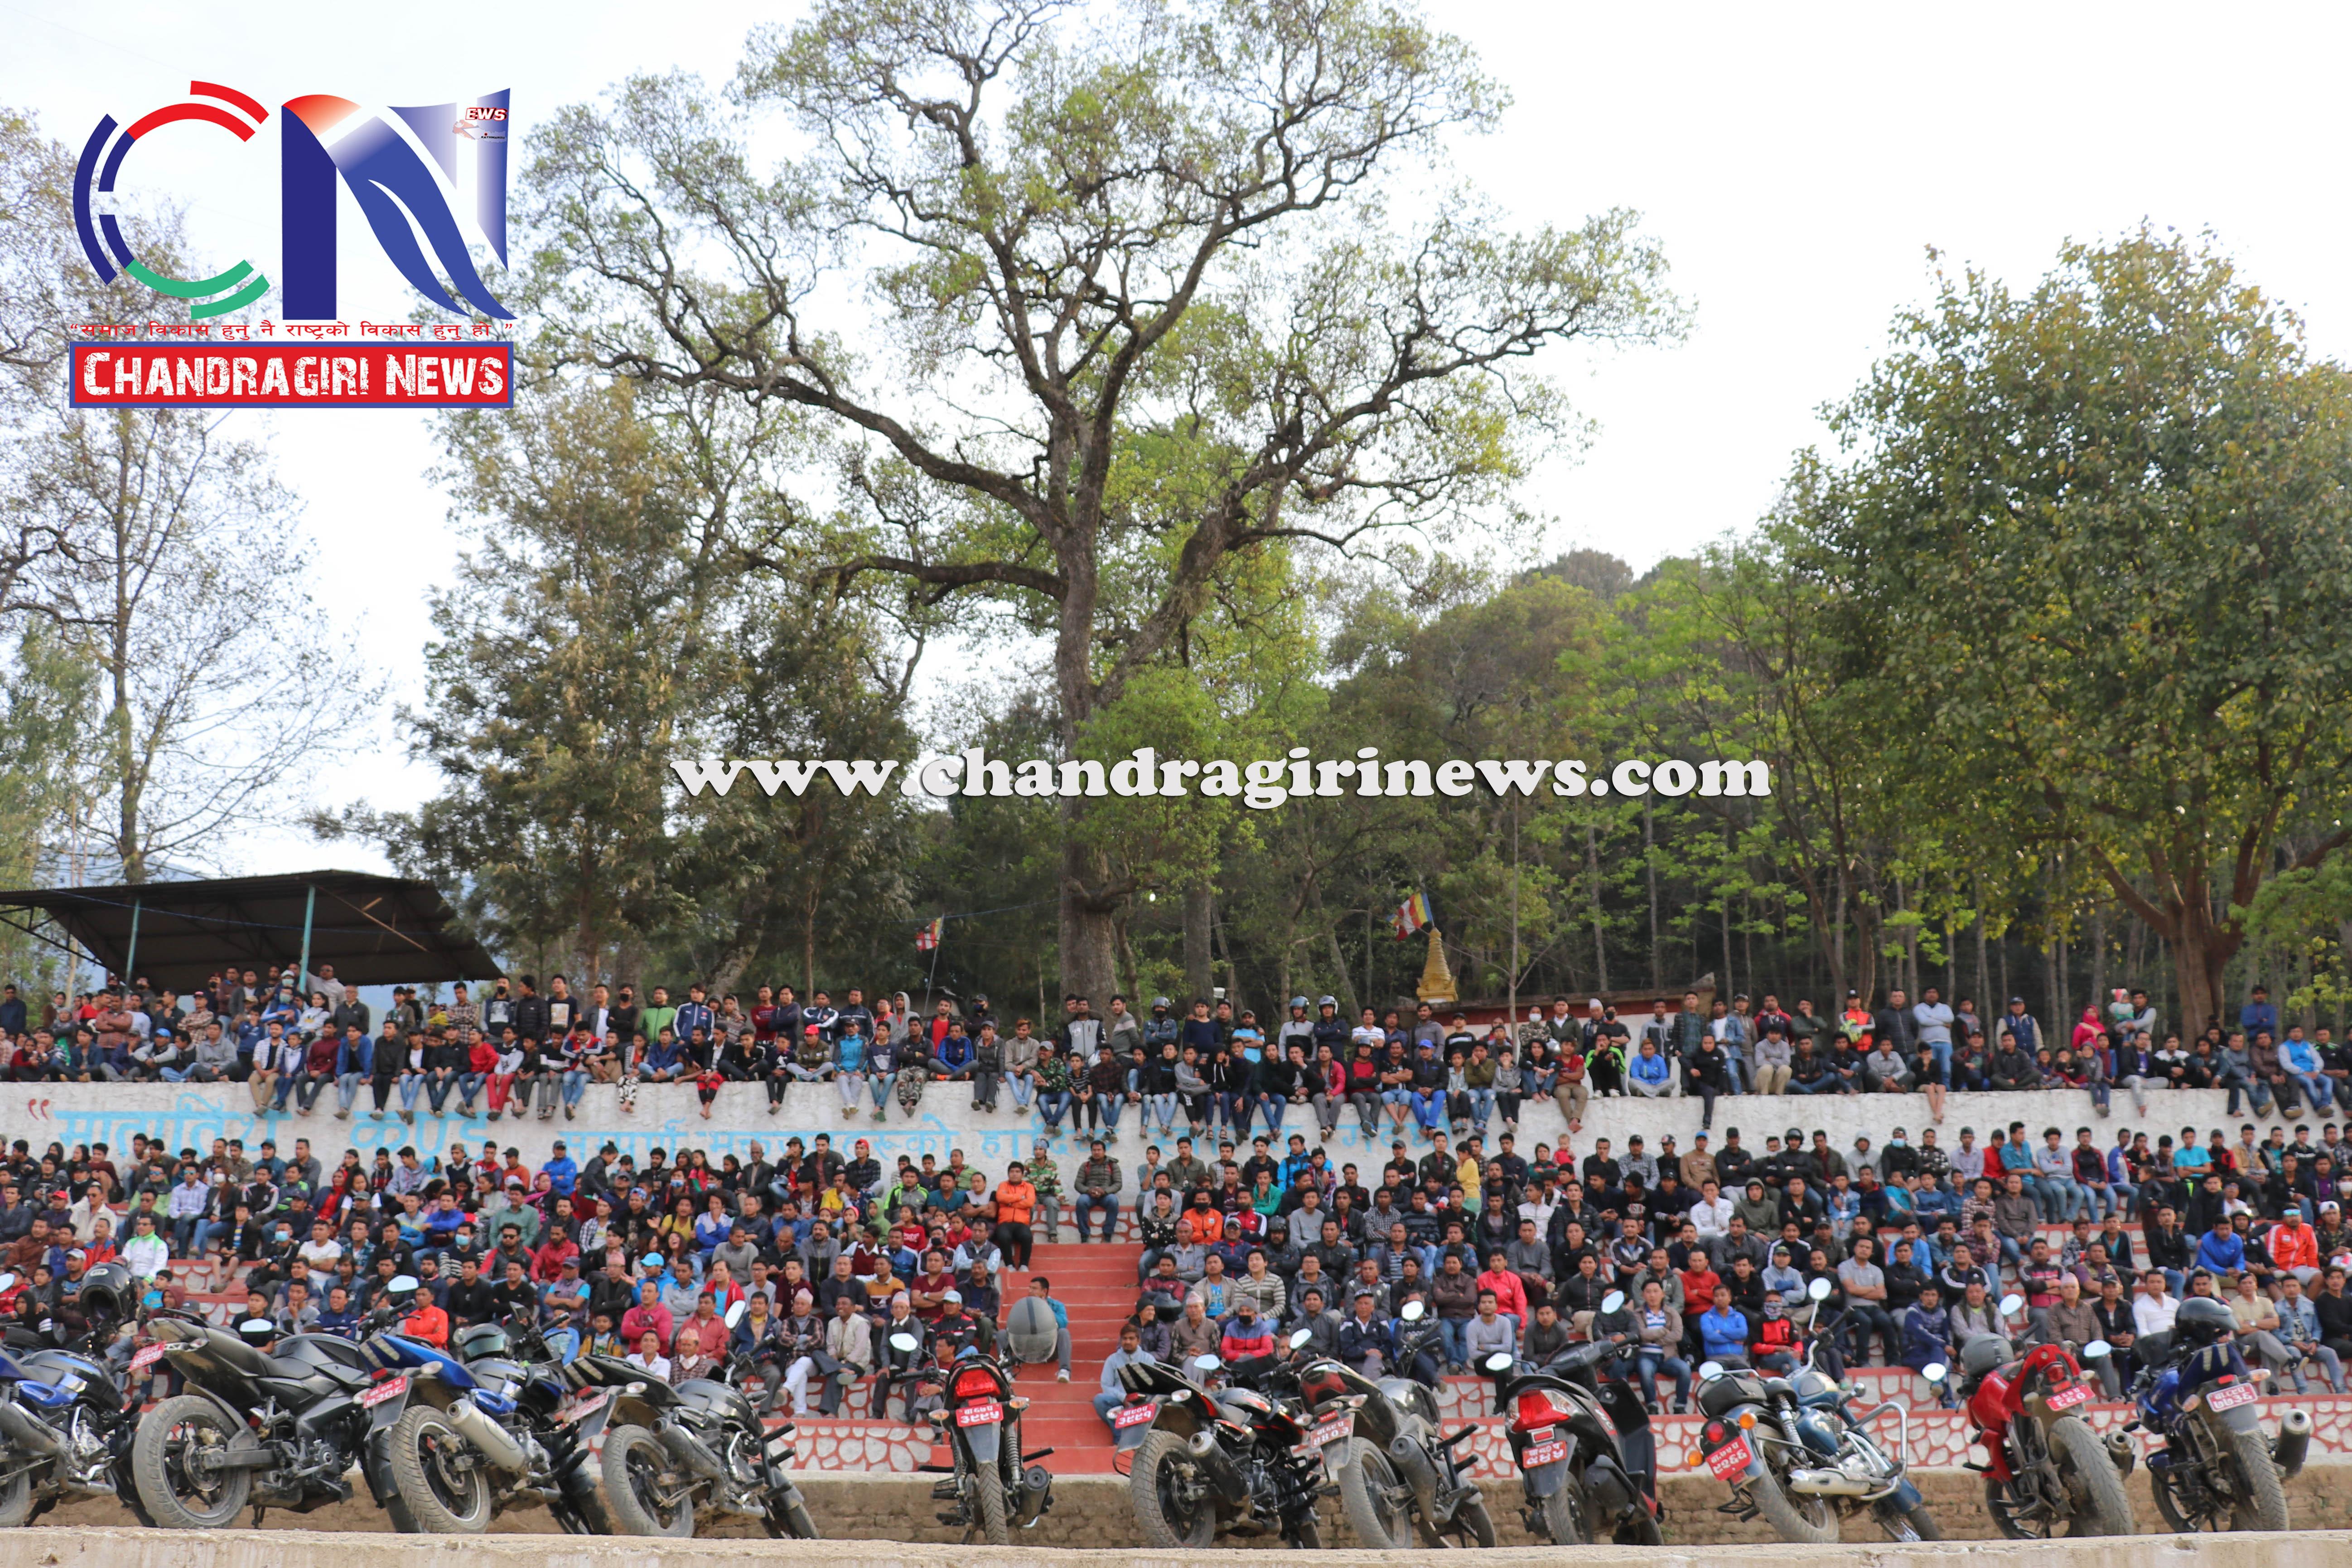 Chandragirinews western-united-first-game-12 चाैठाै  नेपाललय वईस्टन युनाईटेड क्लव फुटबल प्रतियाेगिता सुरू काठमाडौं किसीपिँडी खेलकुद थानकोट ब्रेकिंग न्युज महादेव स्थान मातातिर्थ मुख्य    chandragiri